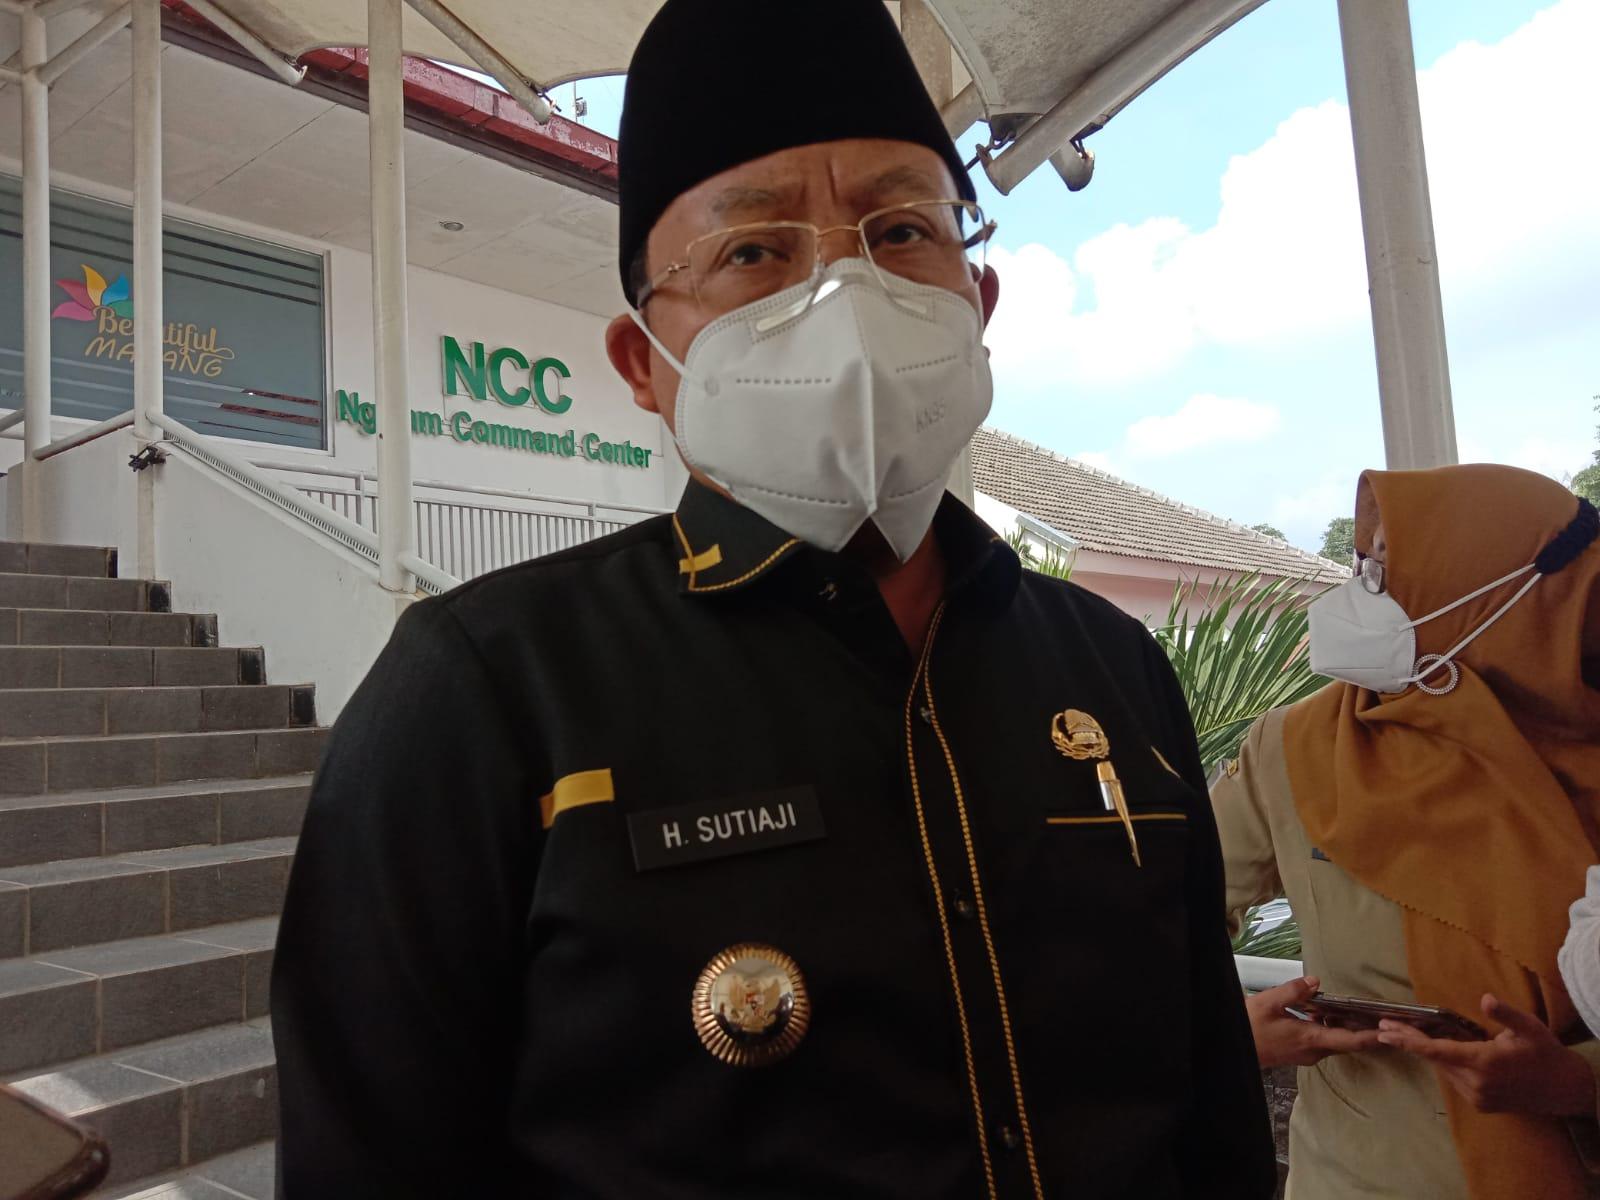 Wali Kota Malang Sutiaji terus melakukan persiapan vaksinasi tahap awal di Kota Malang. (Foto: Feni Yusnia/Tugu Malang)